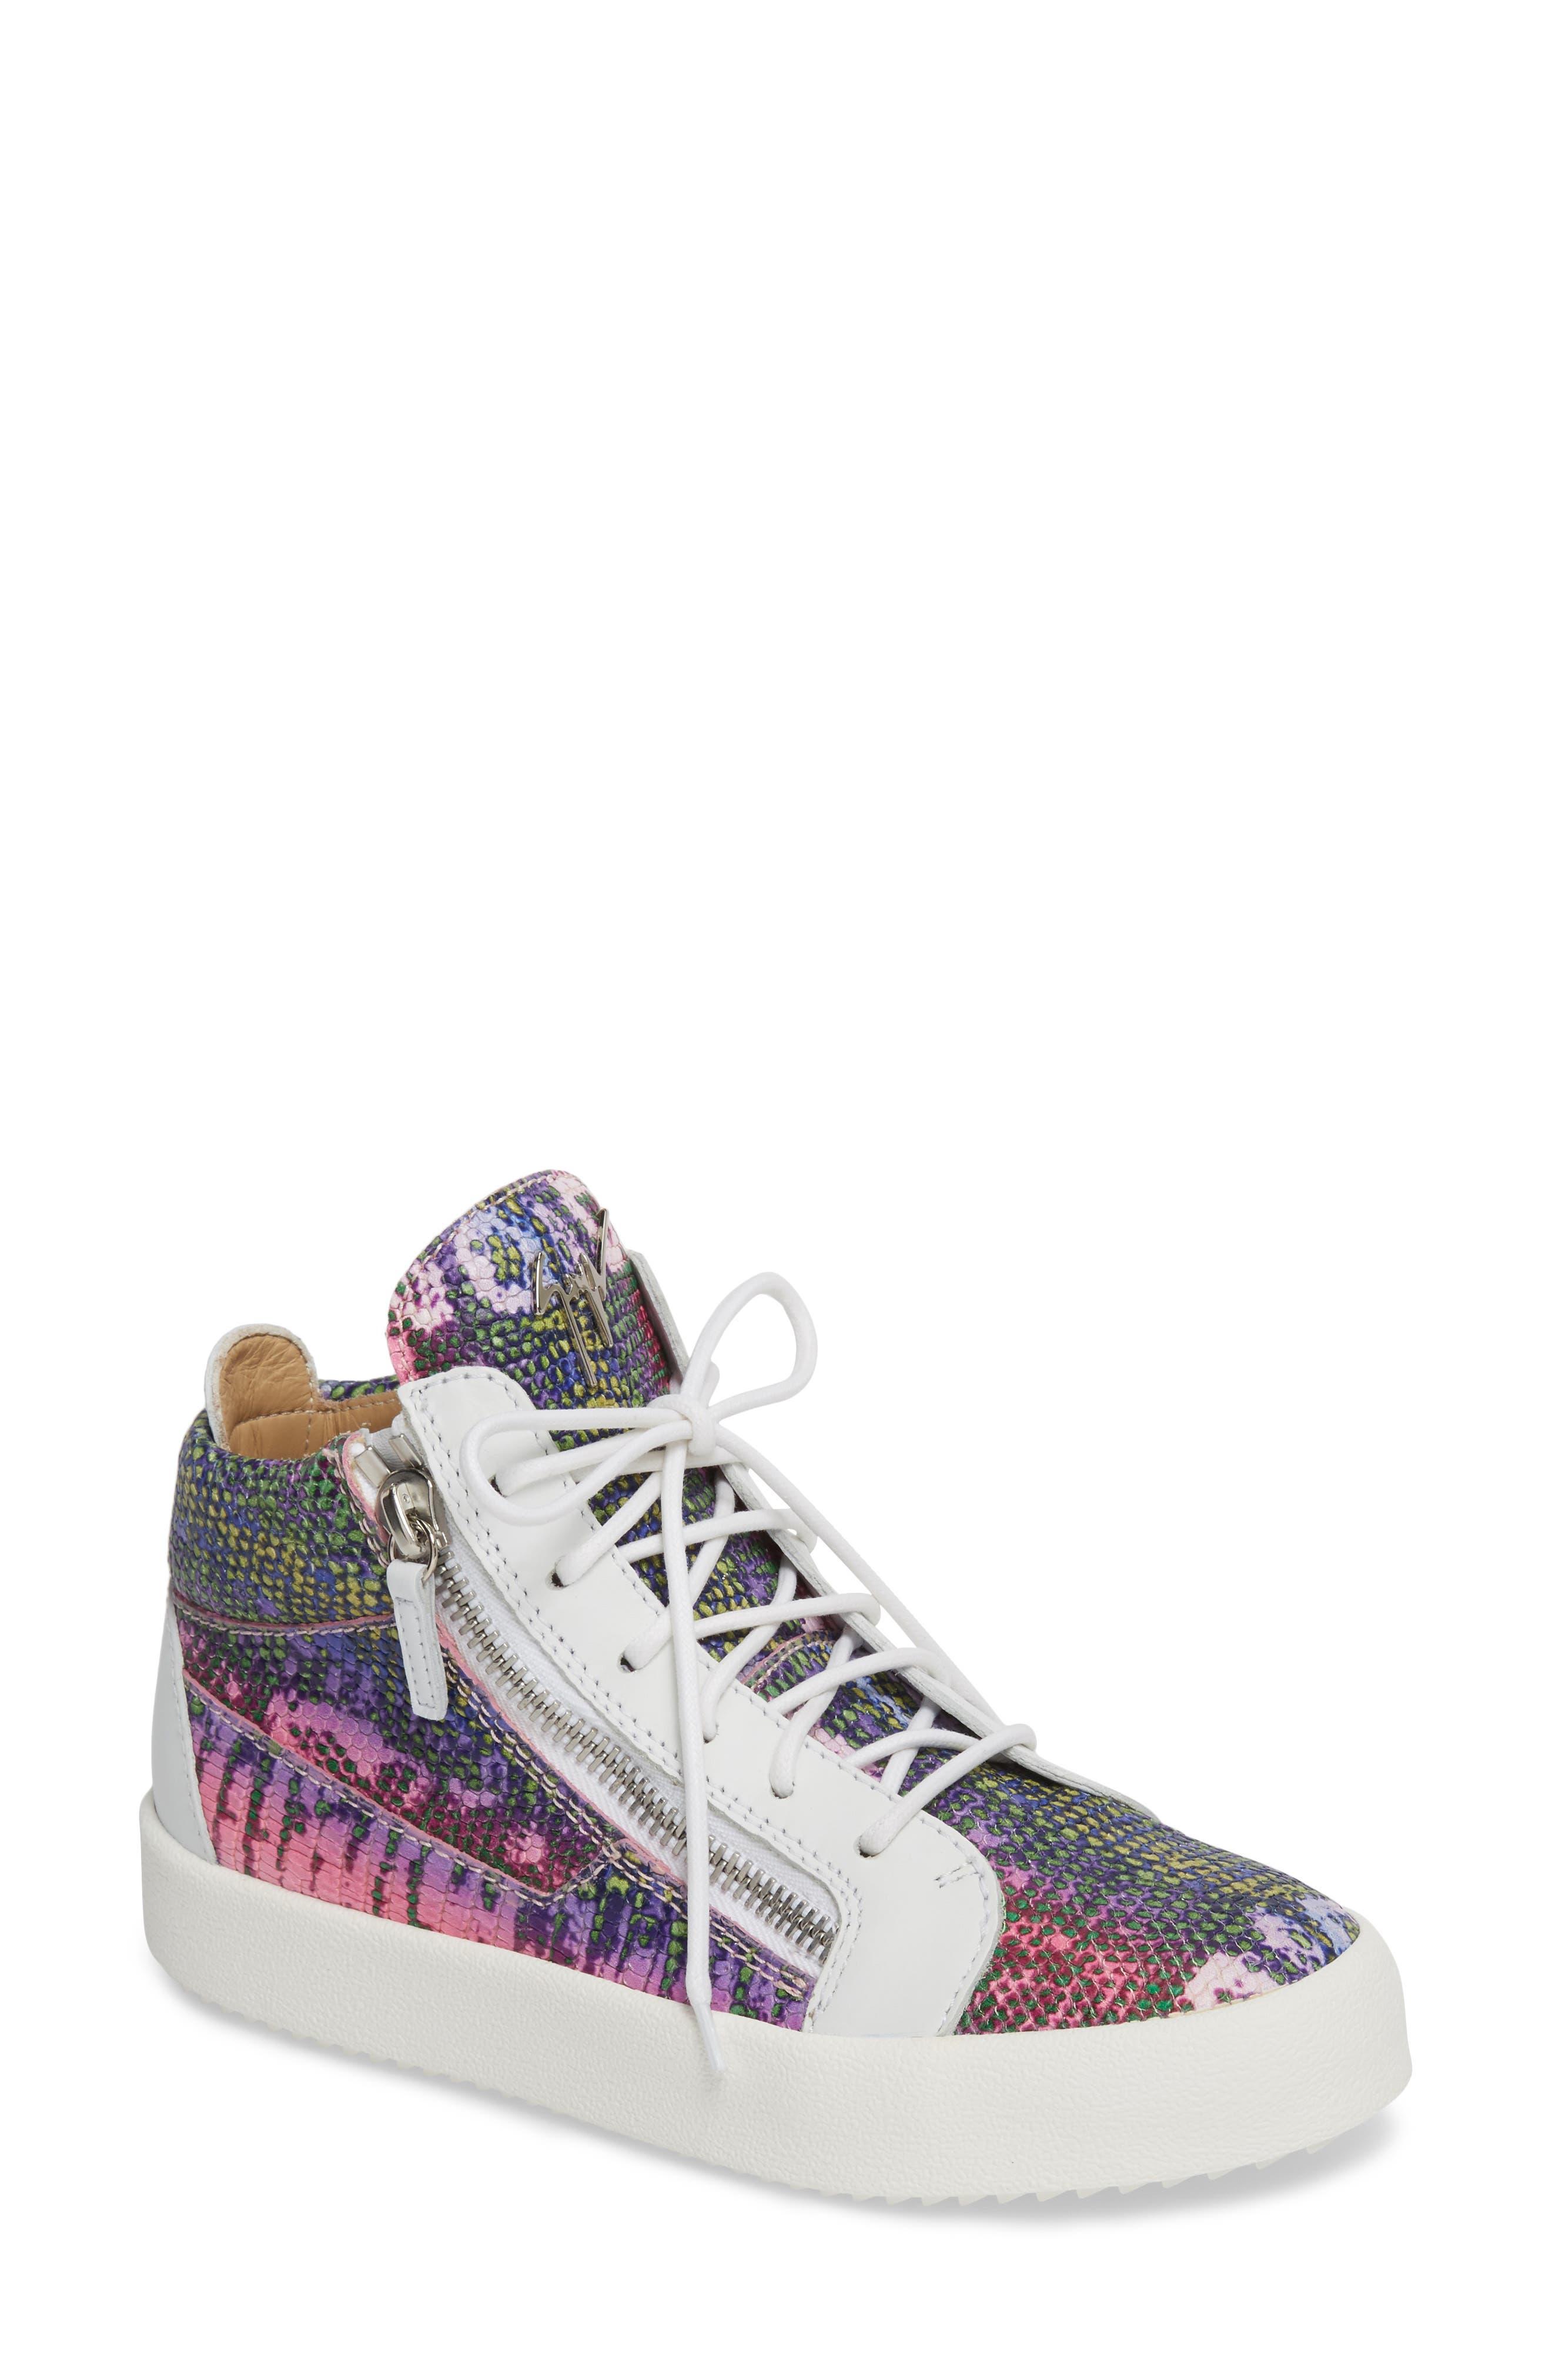 May London Mid Top Sneaker,                             Main thumbnail 1, color,                             PINK MULTI